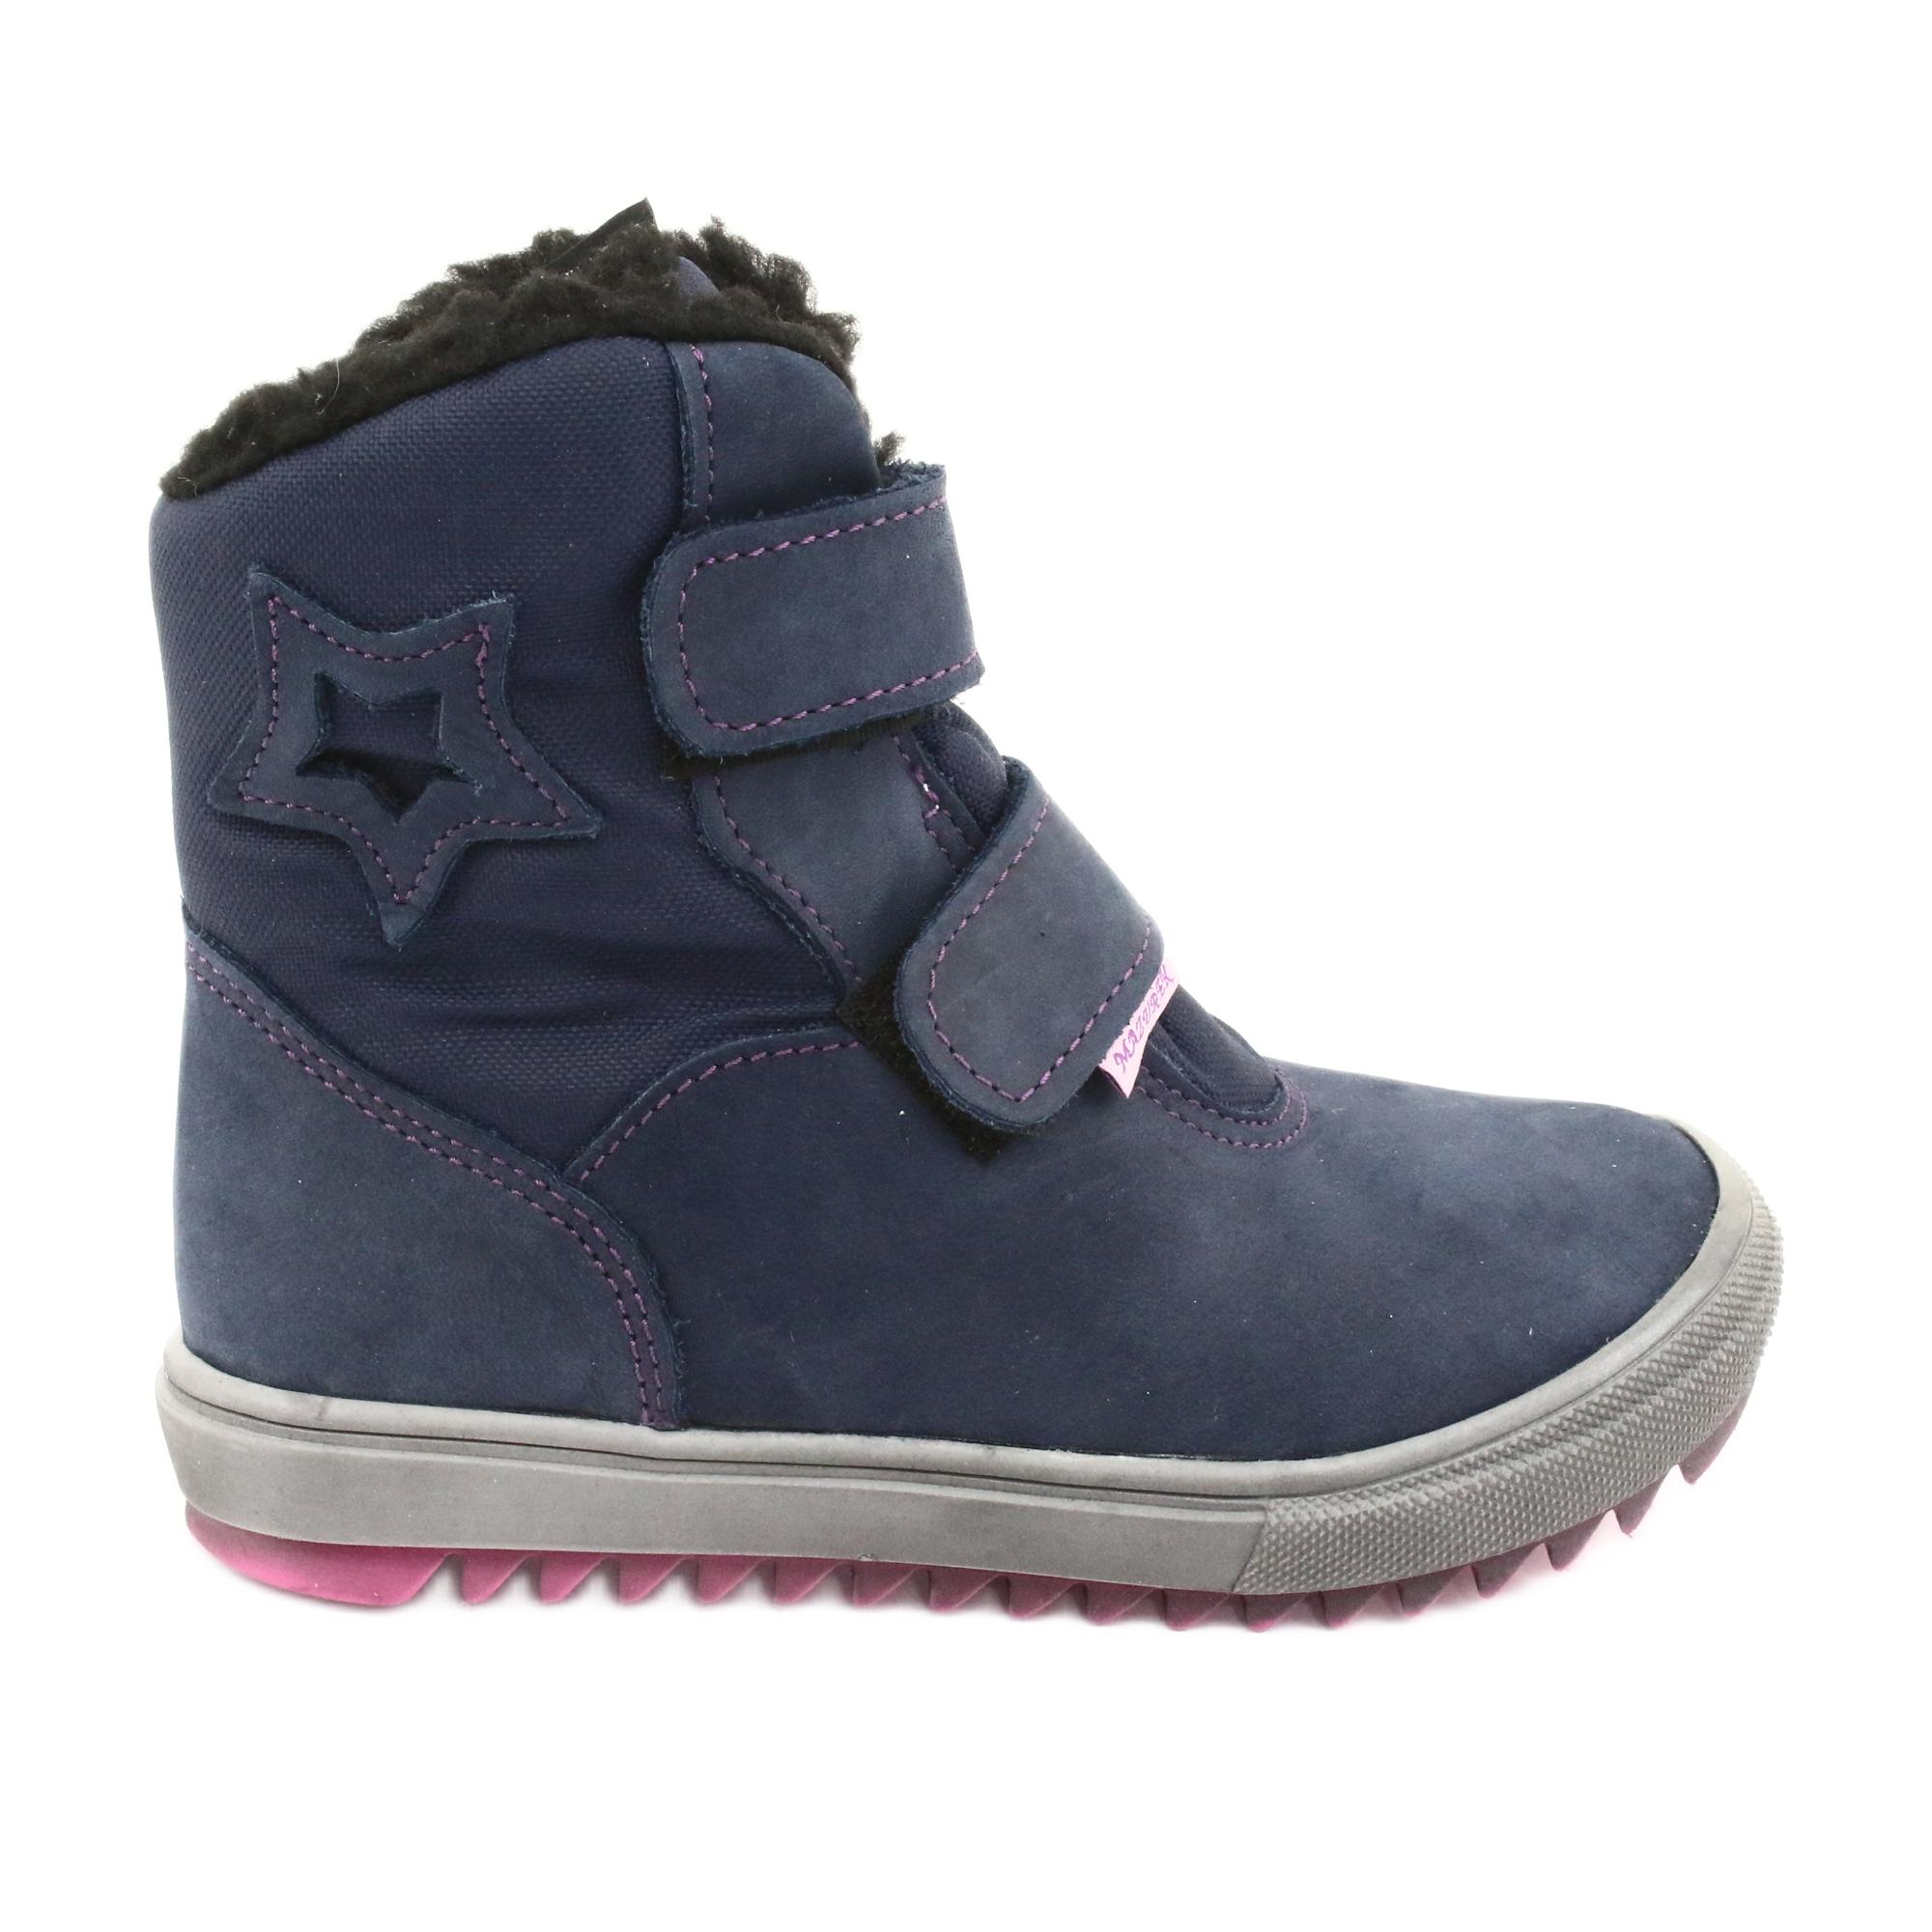 Stivali con una membrana Mazurek 1353 blu scuro marina rosa